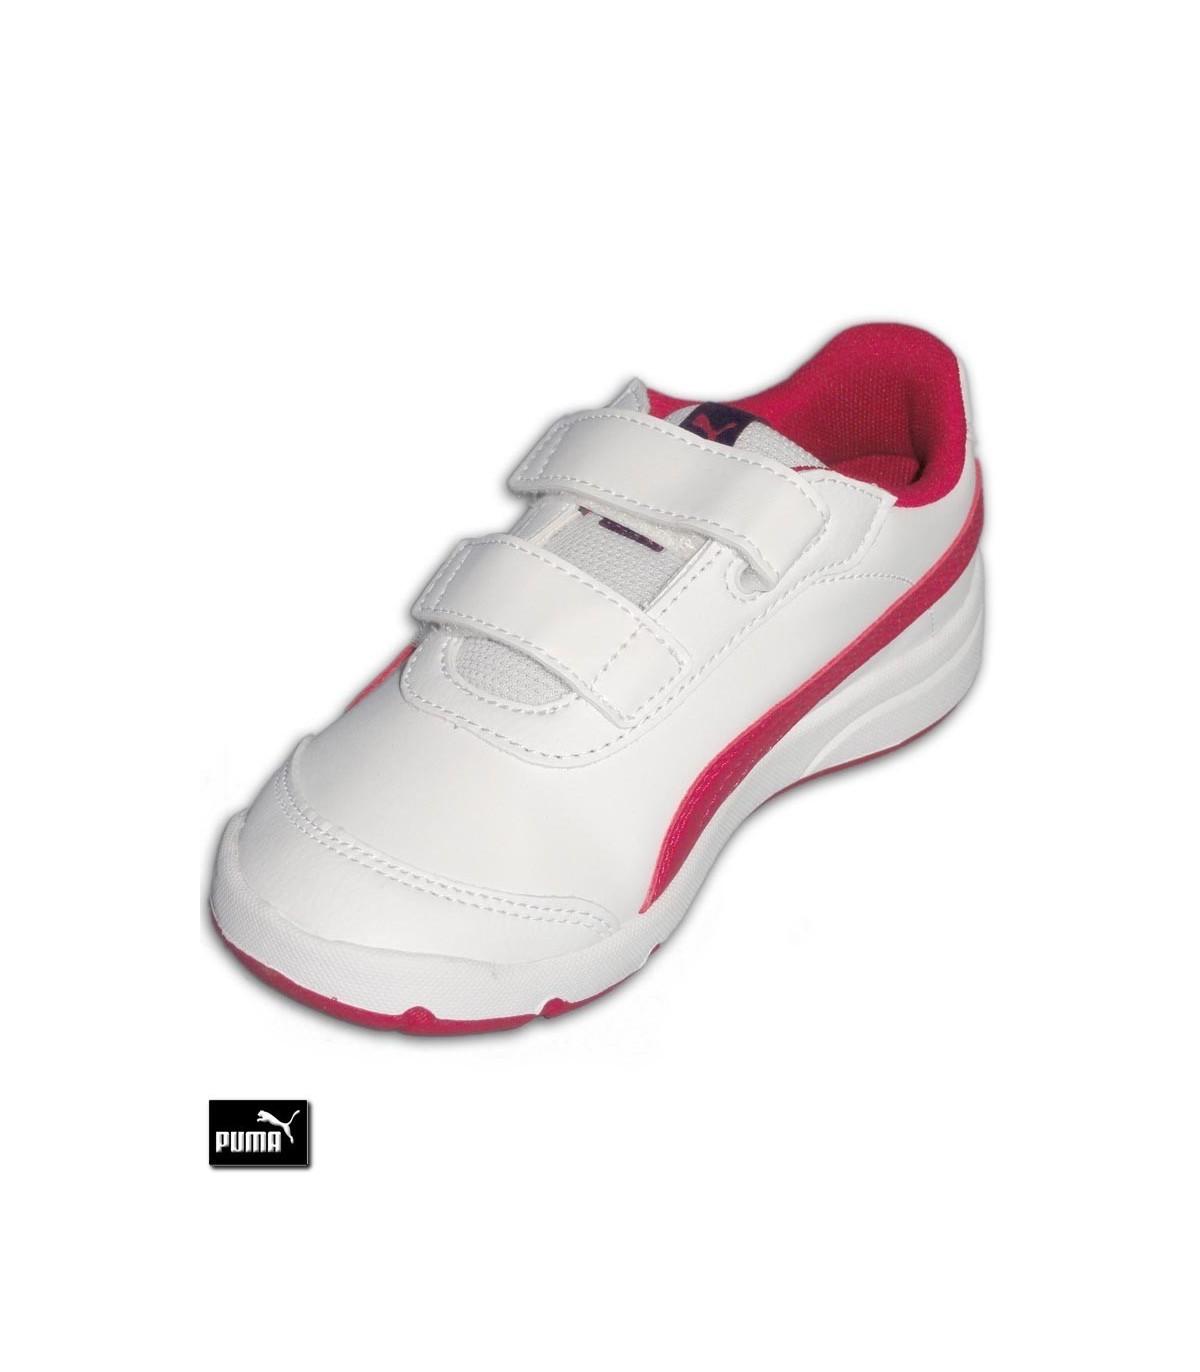 dcadeb6b8a2 ... PUMA STEPFLEEX 2 SL V PS Velcro Blanco-Rosa · Zapatilla Deporte Ni